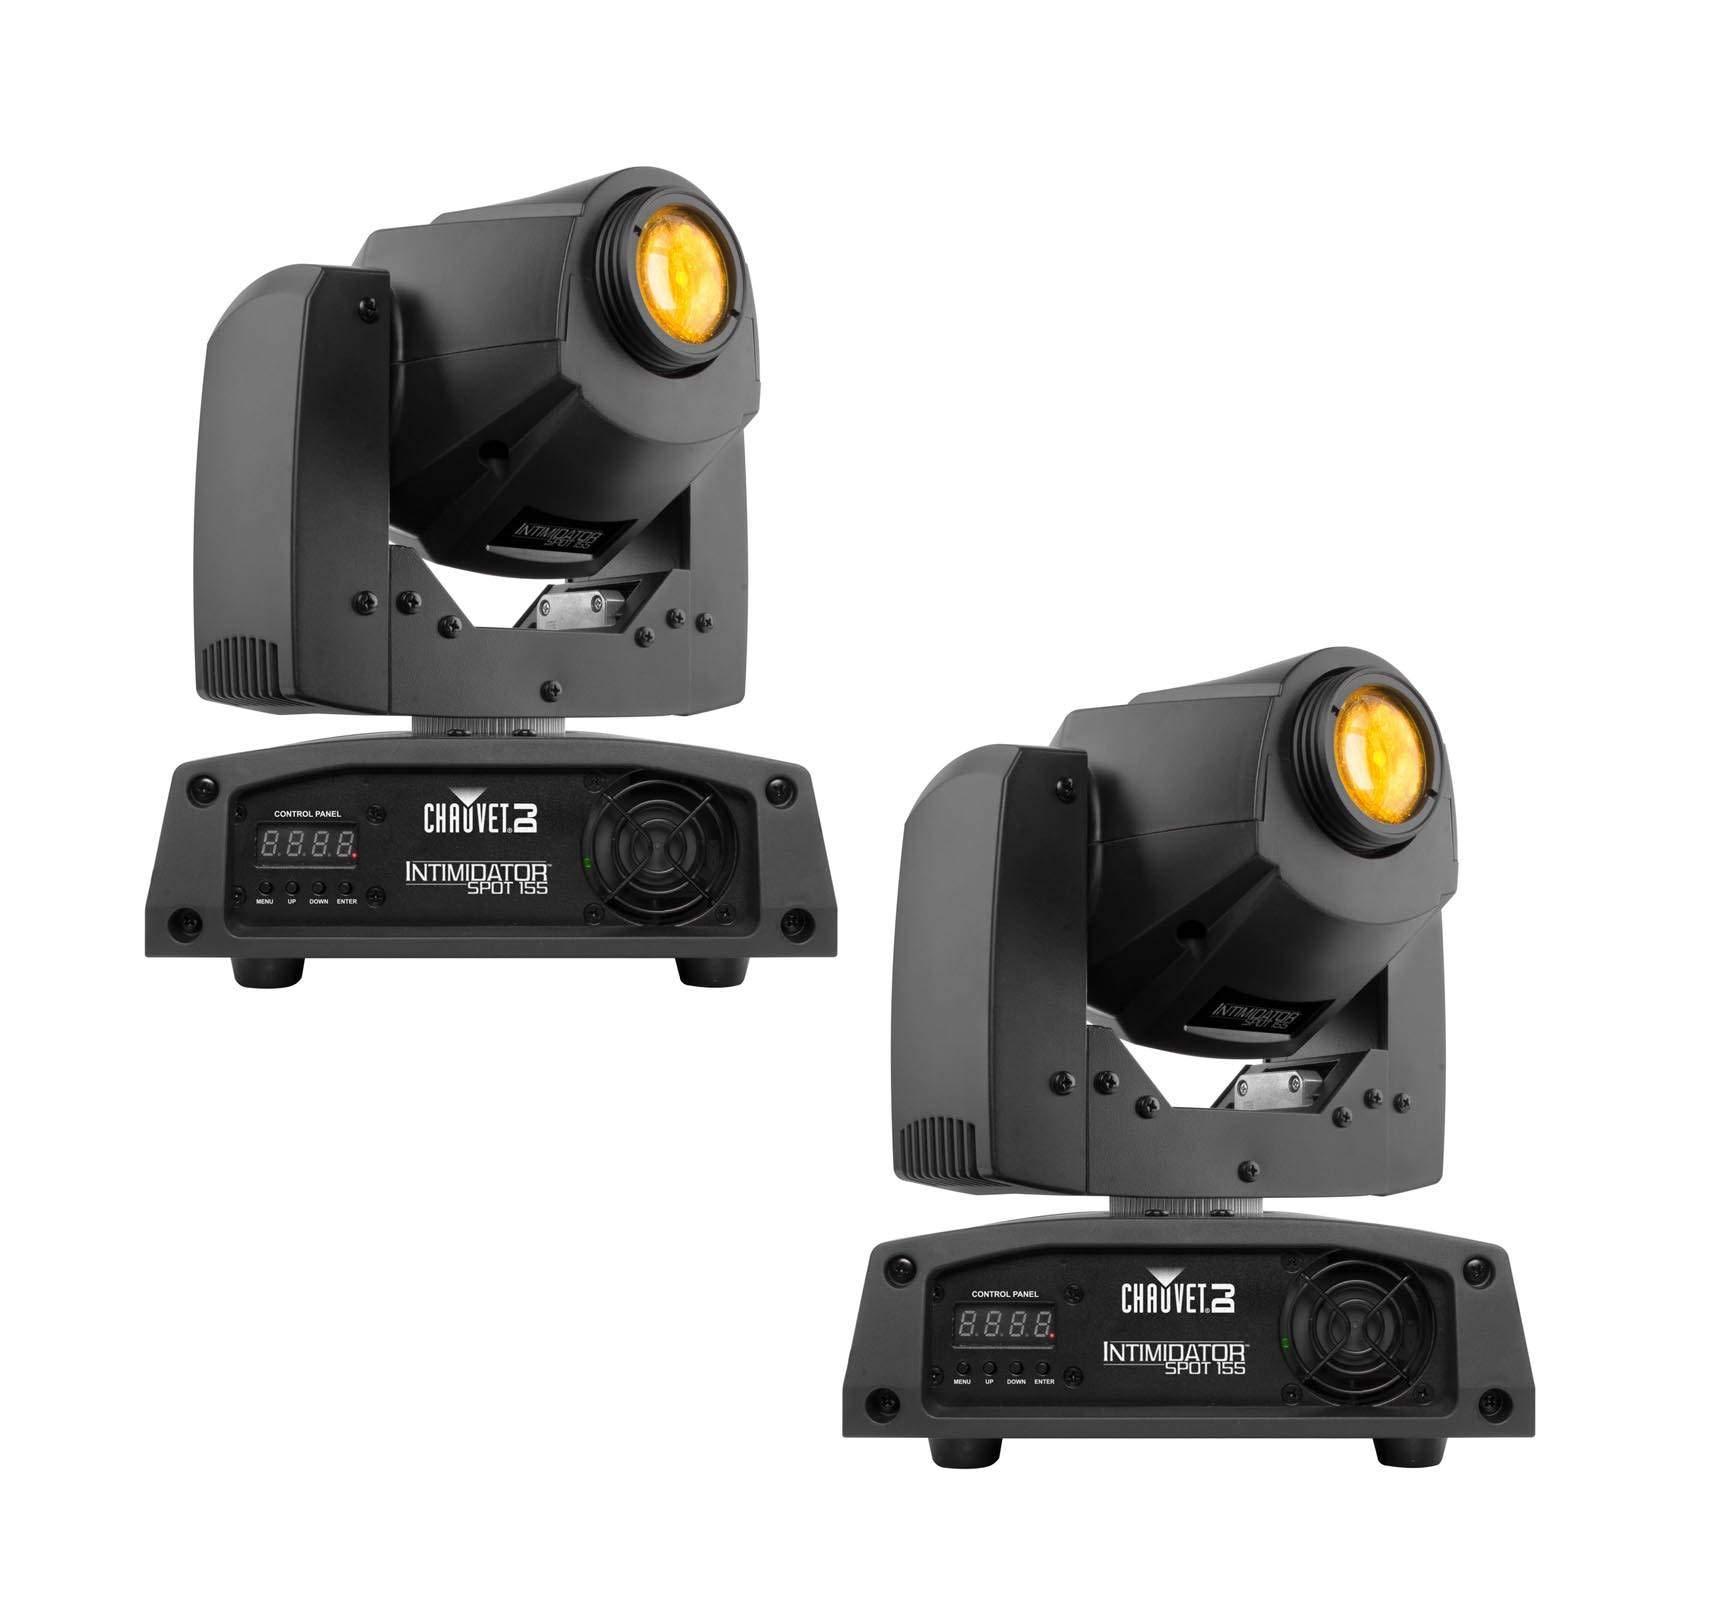 2 CHAUVET Intimidator Spot 150 LED DMX Moving Head Yoke DJ Club Lighting Effects by CHAUVET DJ